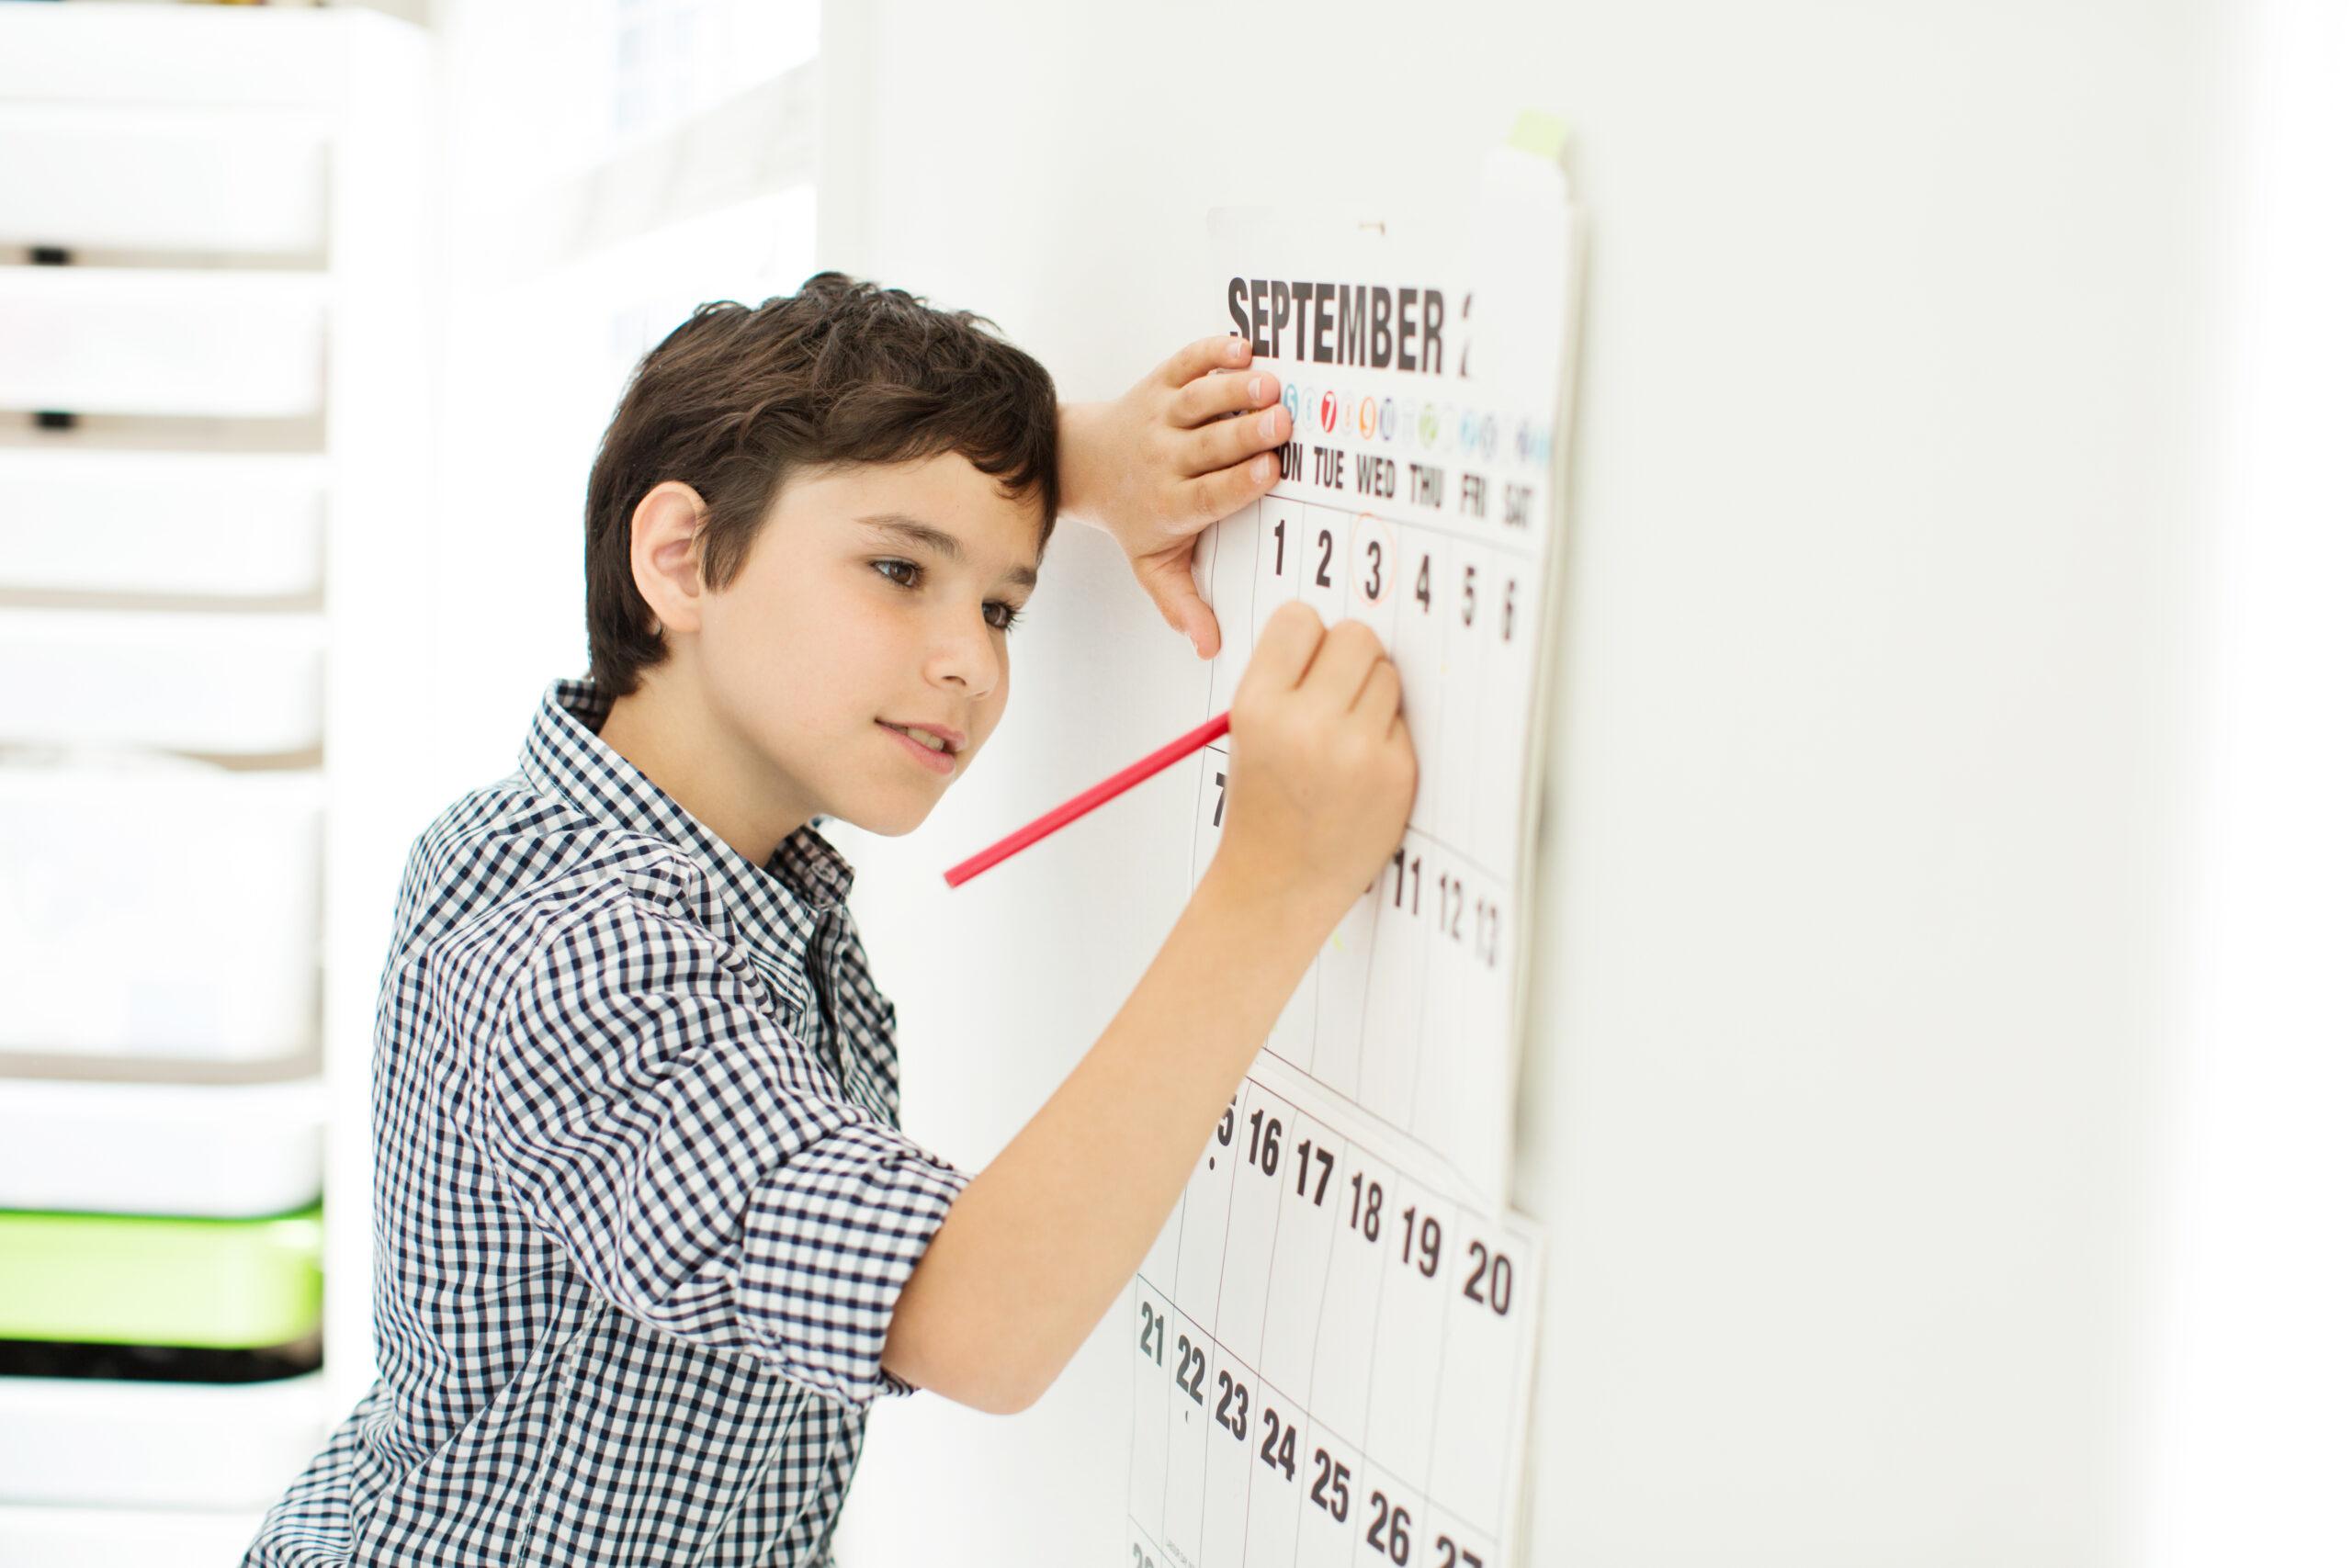 Student writing on Calendar